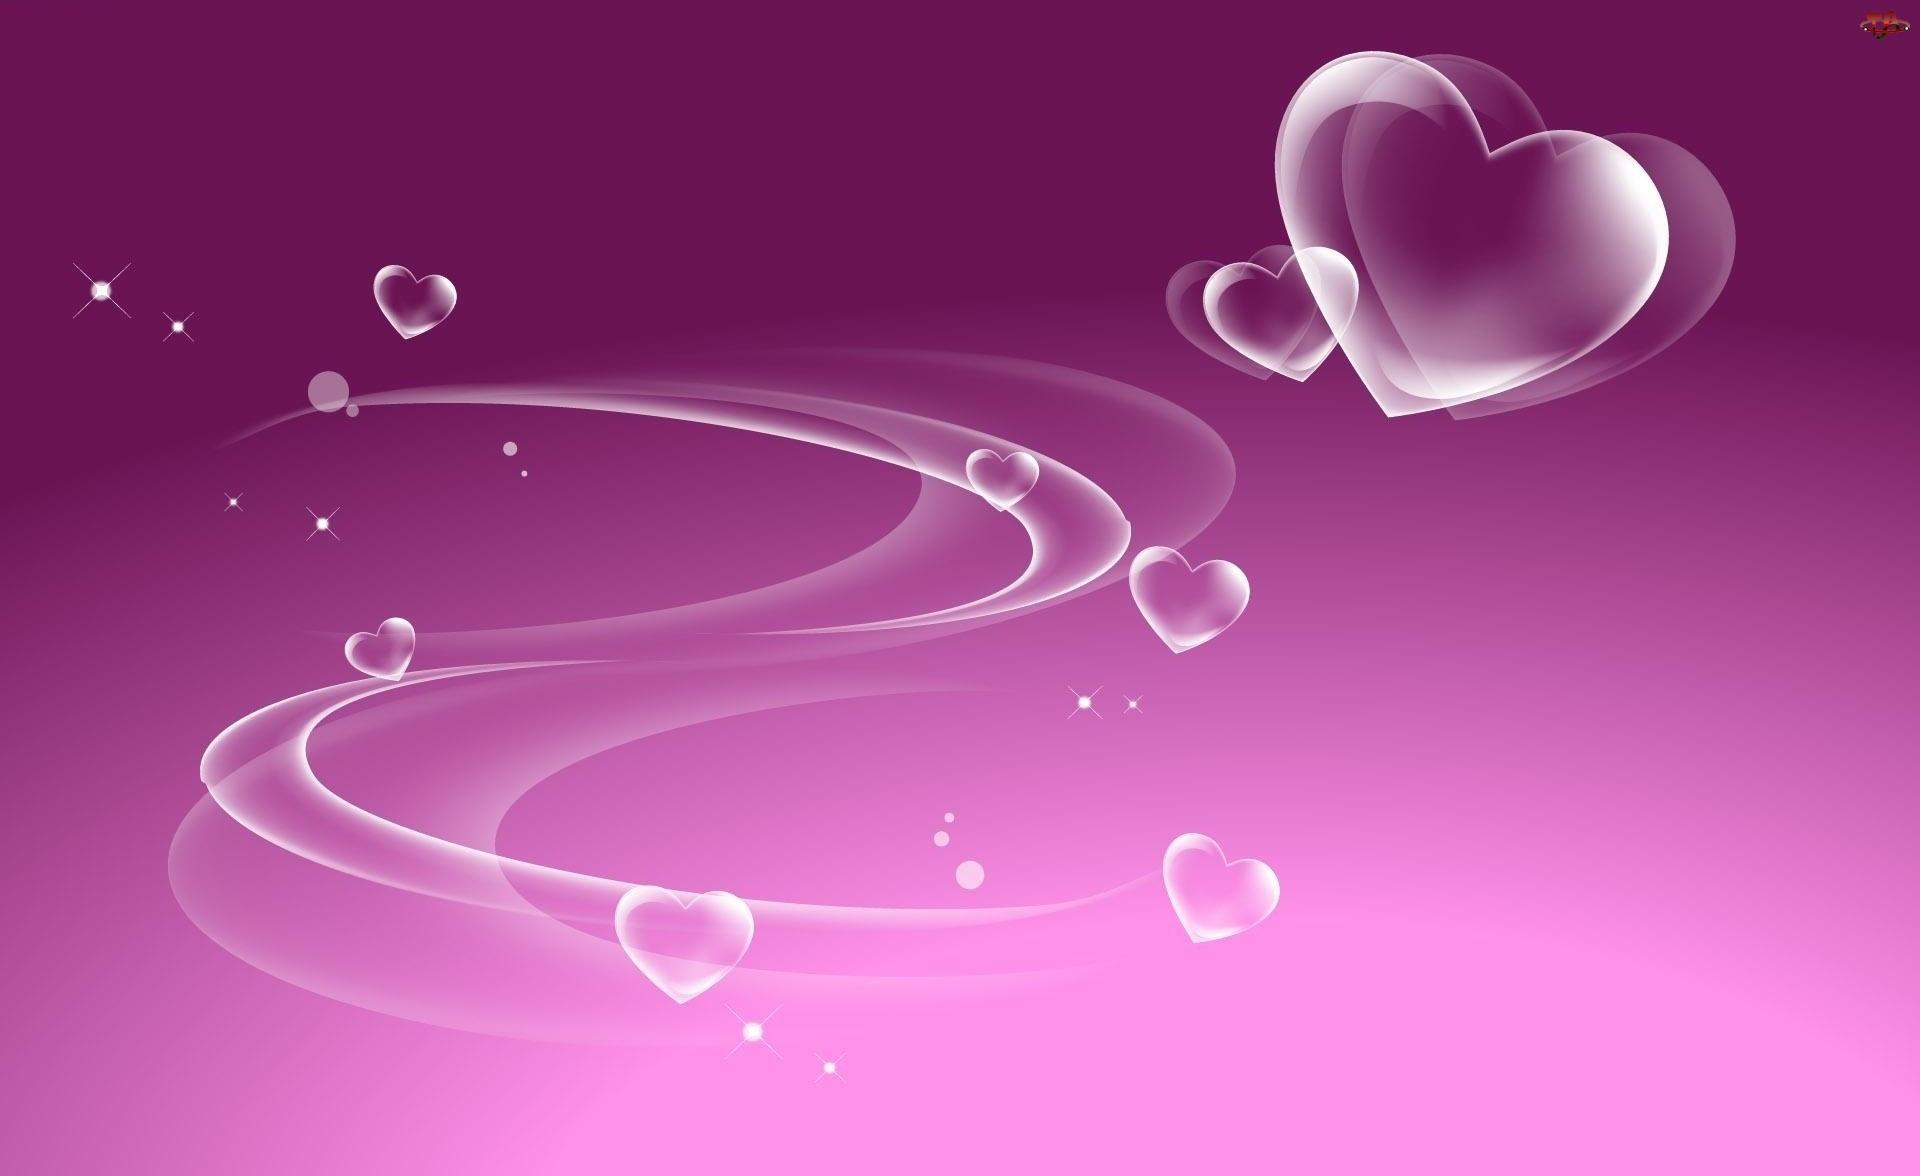 Walentynkowe, Serca